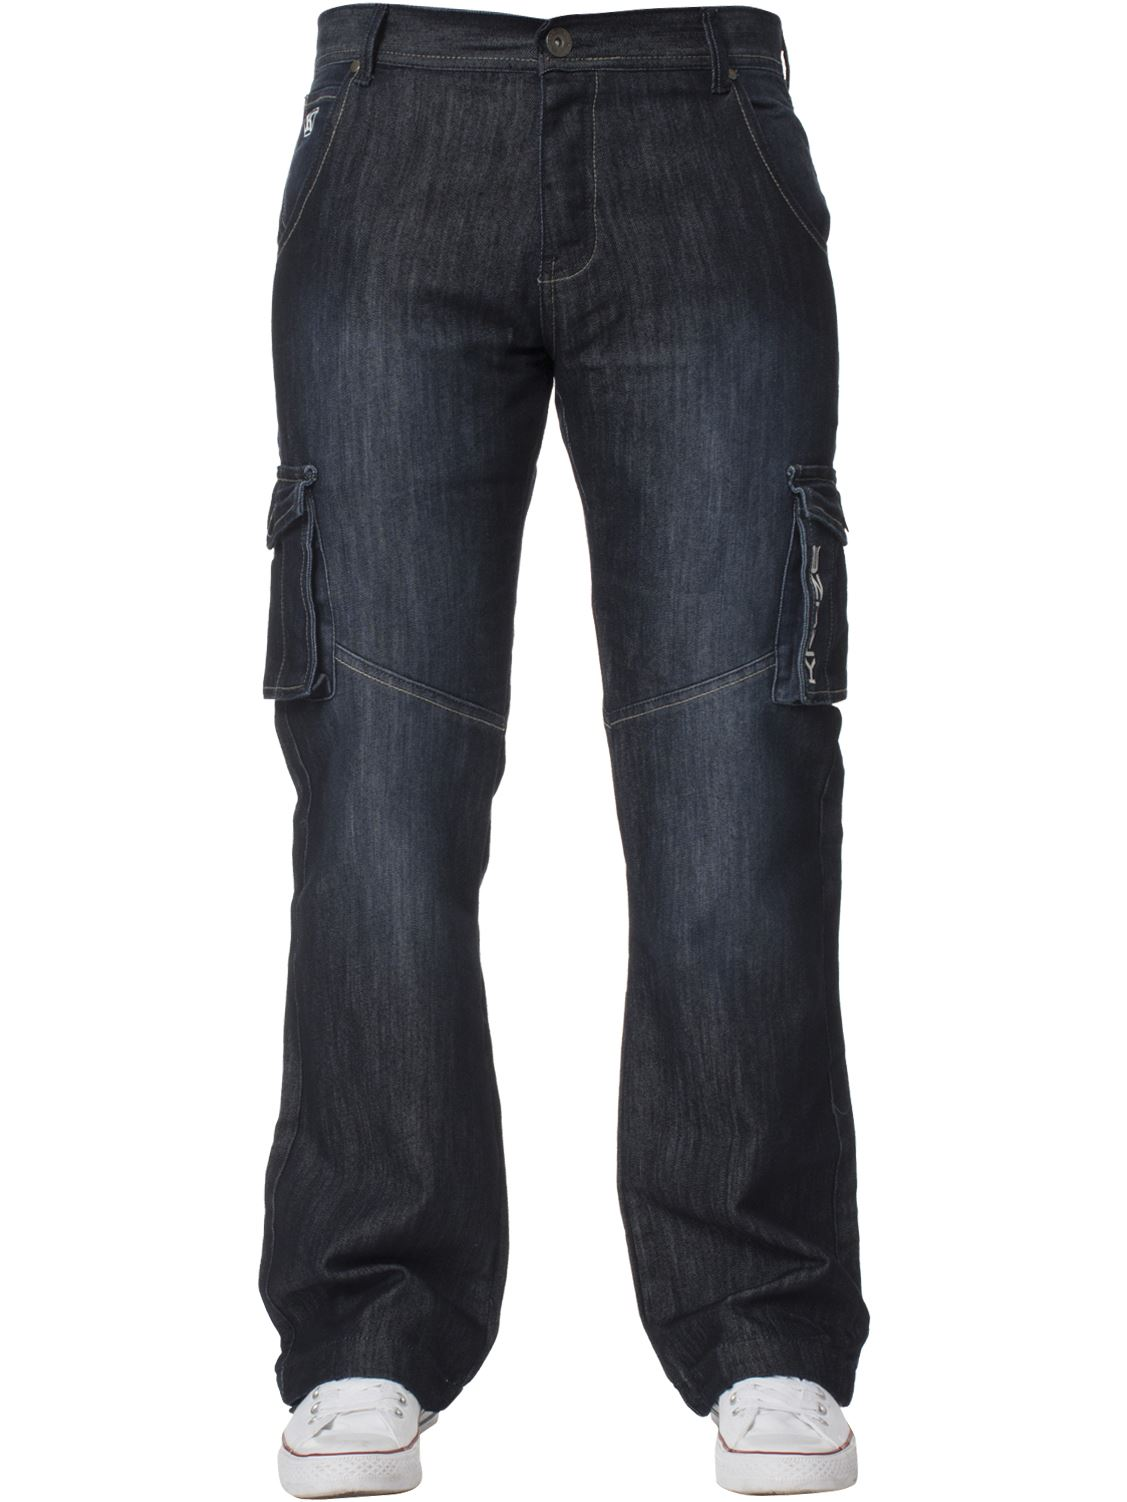 Grandes-jeans-para-hombre-de-combate-de-Kruze-Rey-Alto-Pierna-Cargo-Pantalones-Jeans-Pantalones miniatura 11